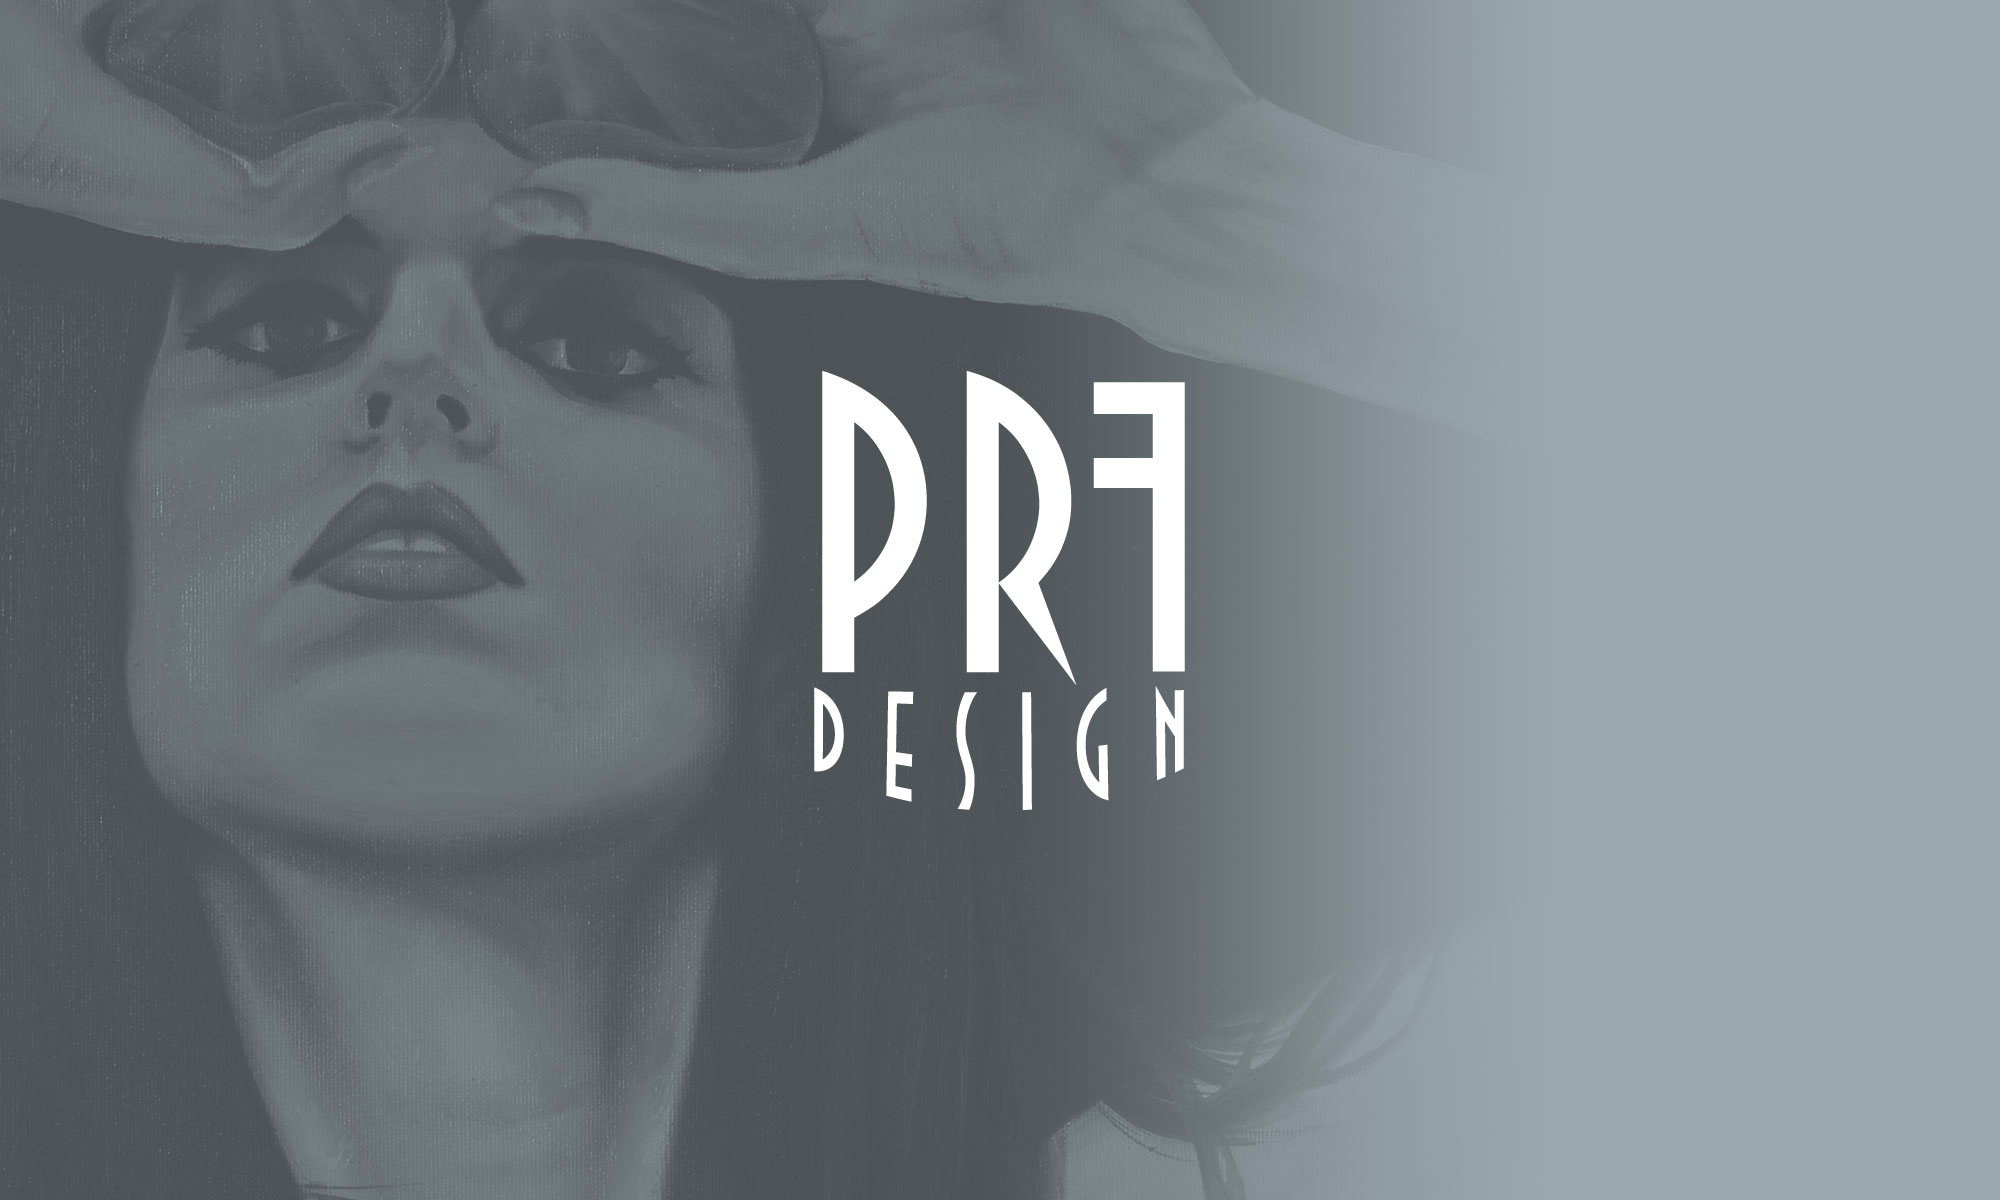 PRF Design - Pierfilippo Bucca